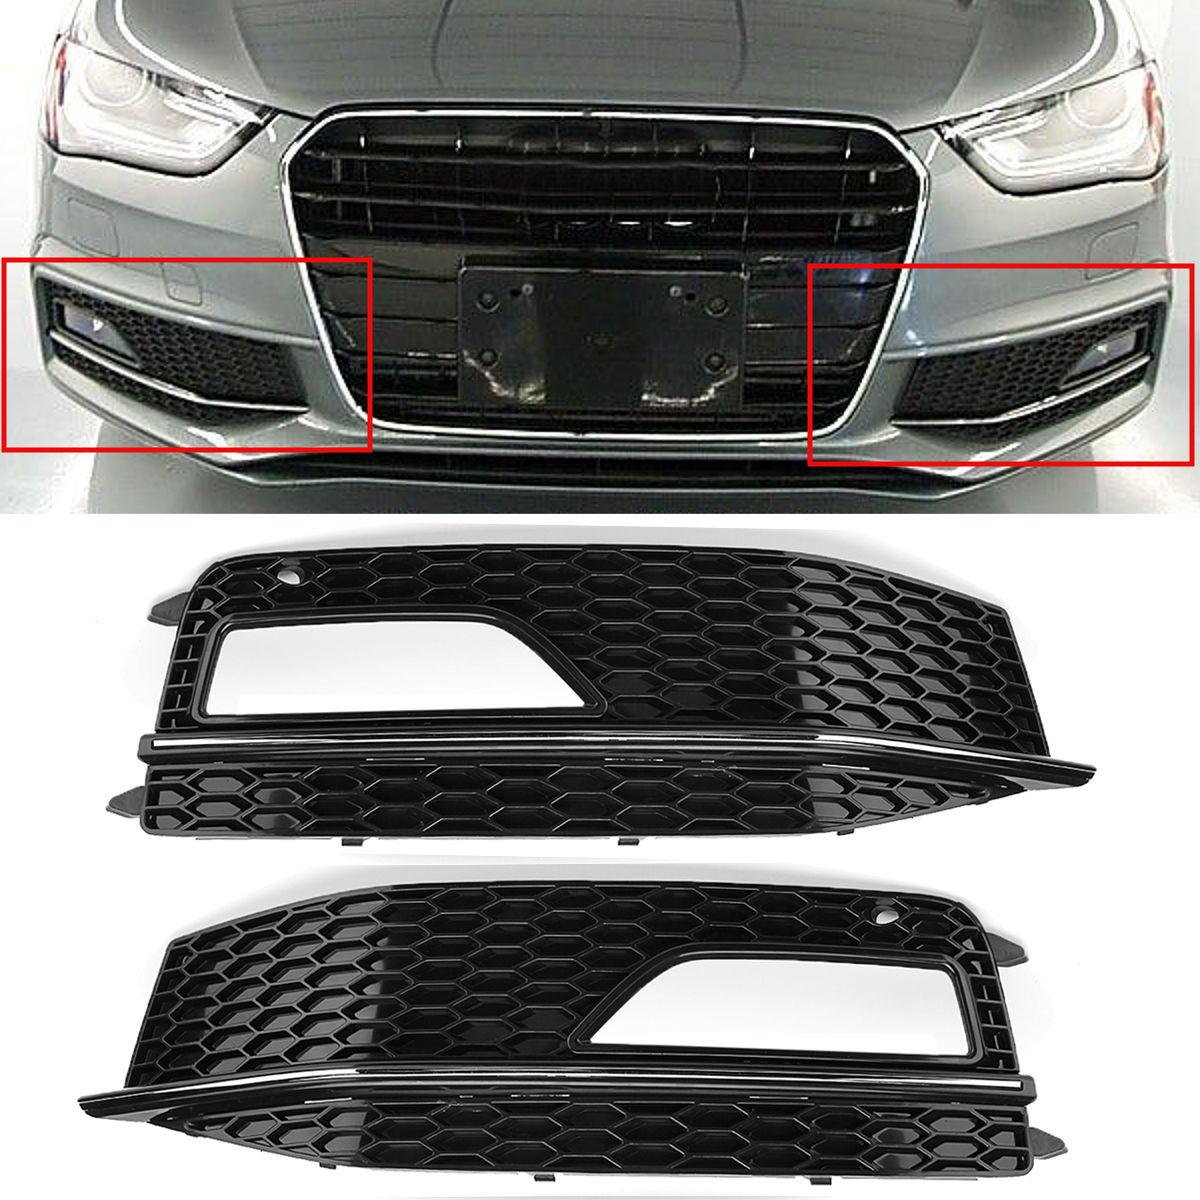 Audi A4 B8 Yrs 12 15 Honeycomb Black Foglight Grills Rs4 S Line Models